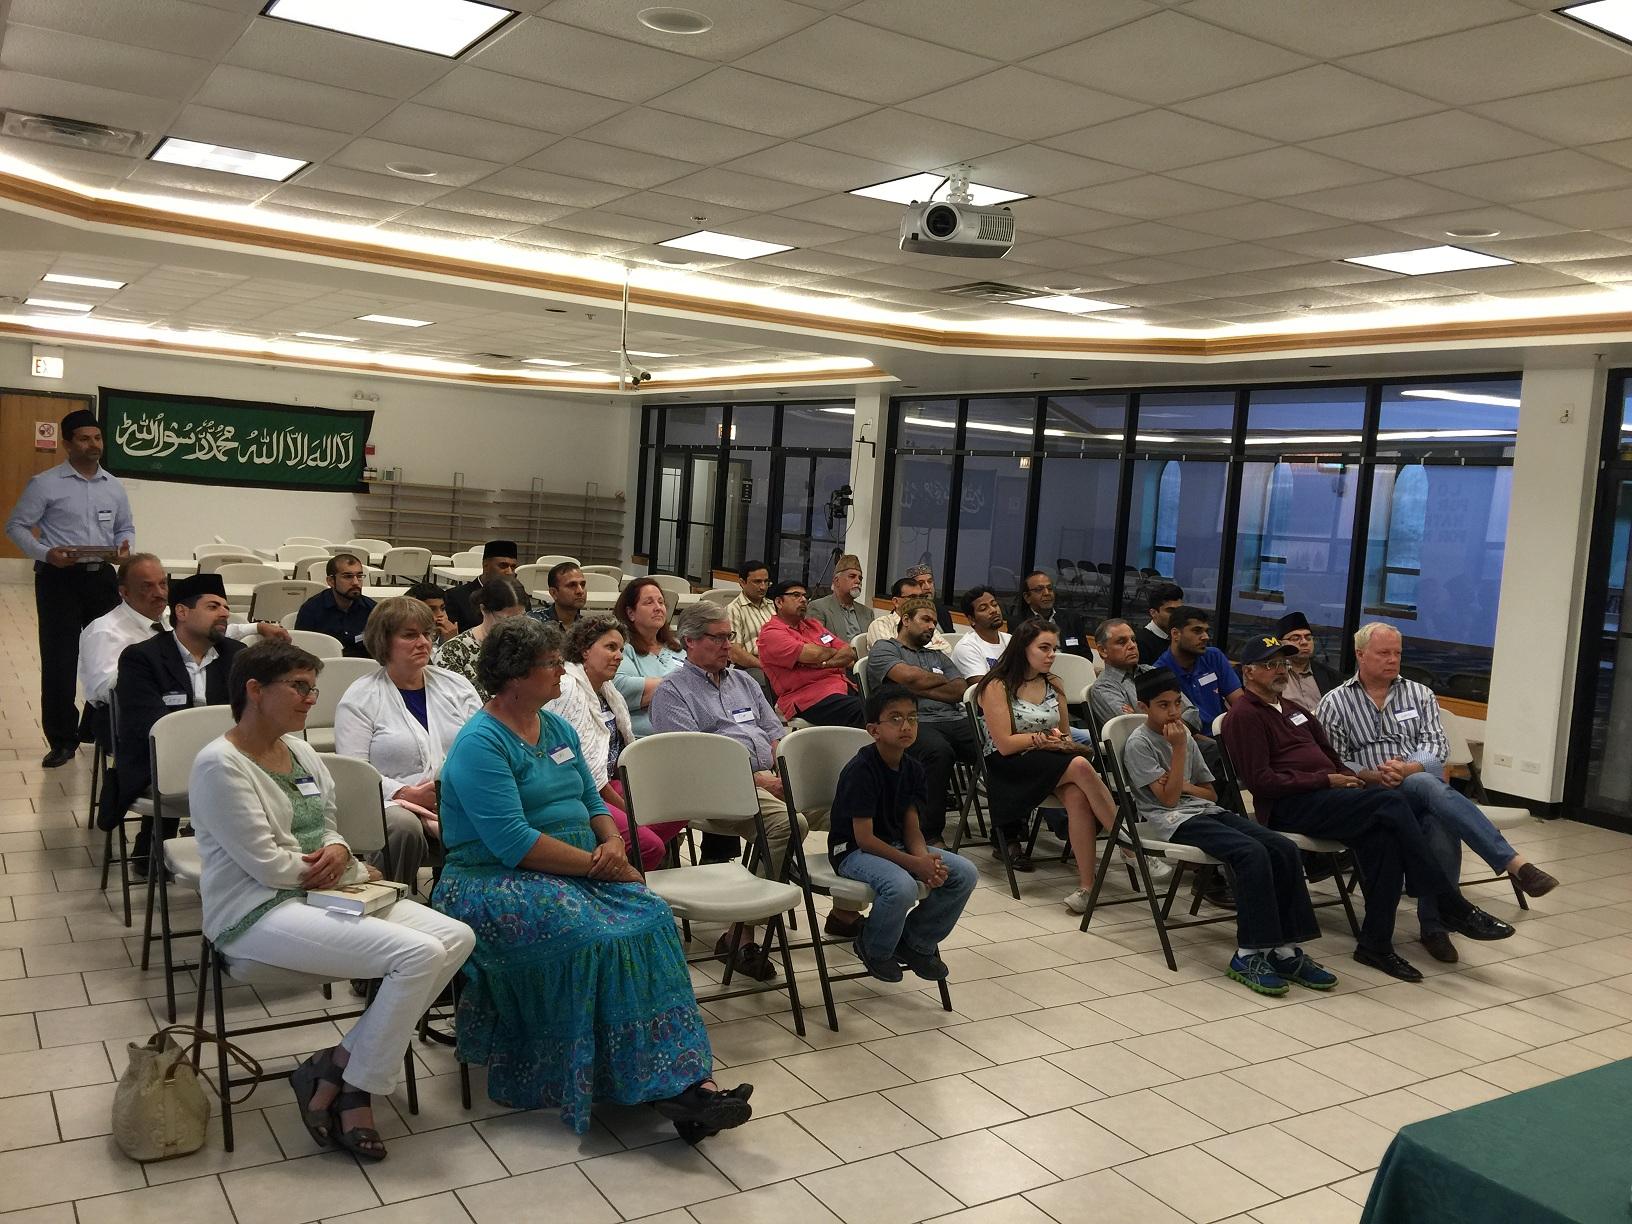 USA: Interfaith program held in Chicago's Ahmadiyya Mosque